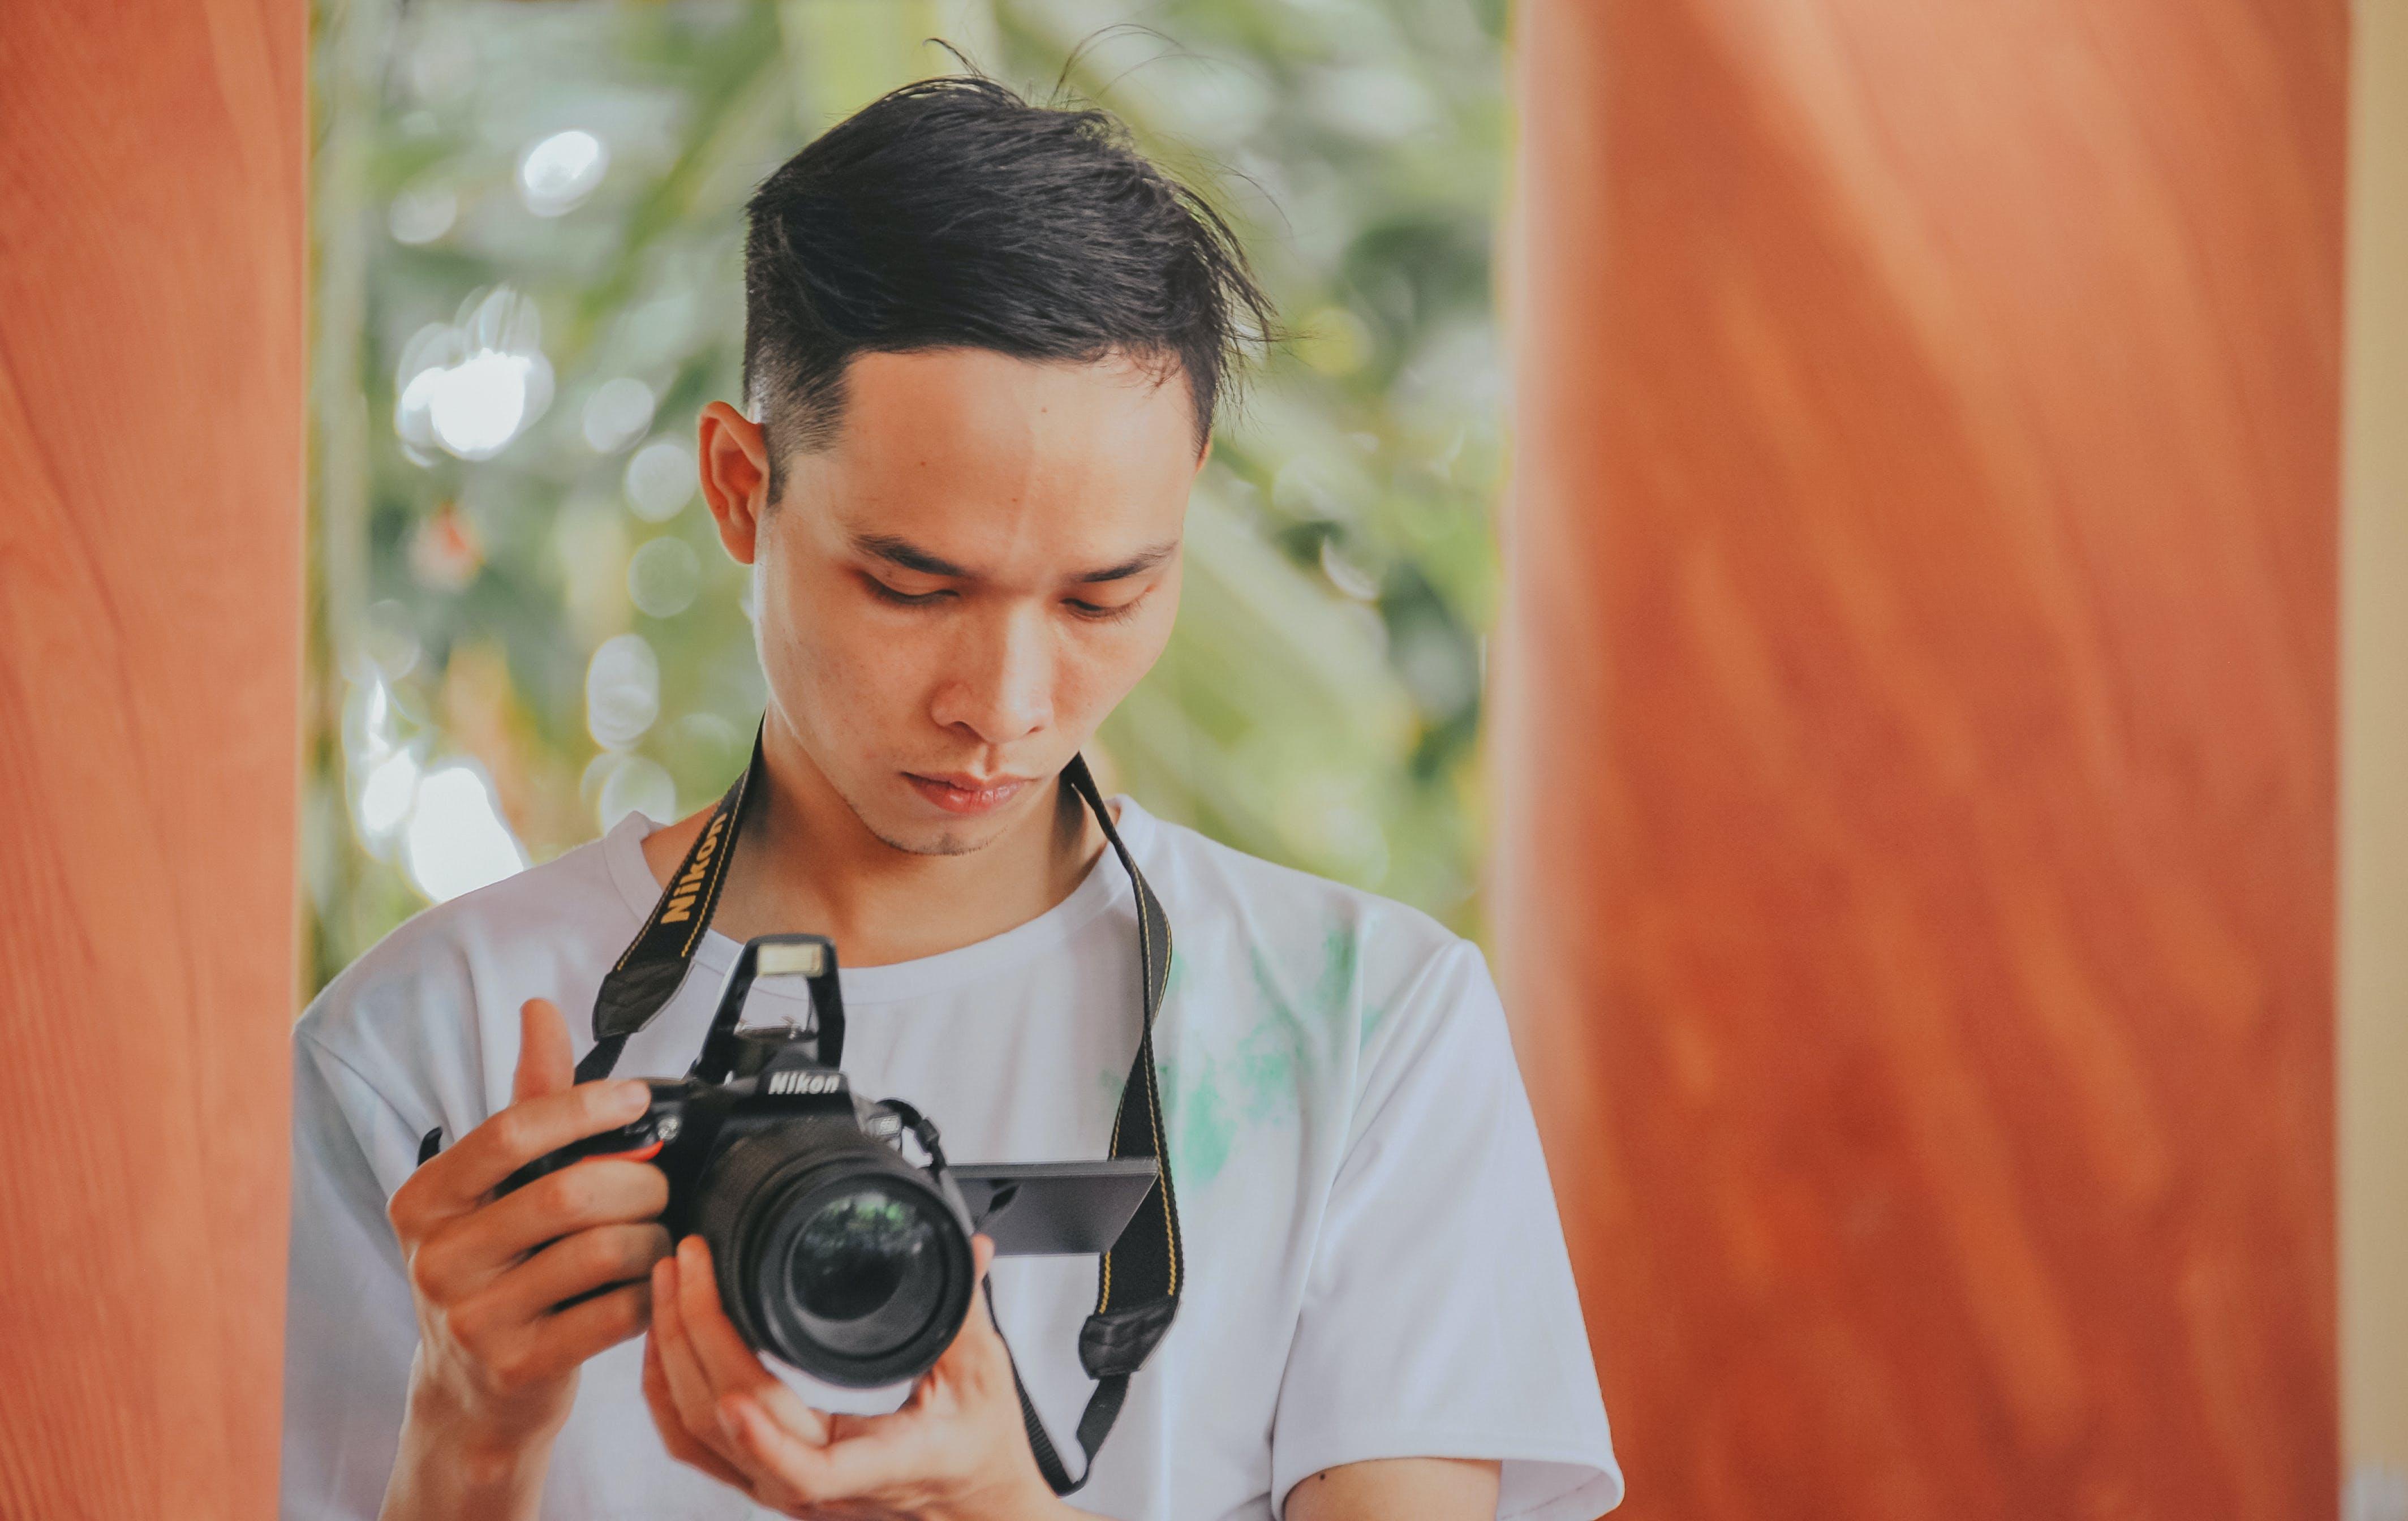 Person Holding Nikon Camera